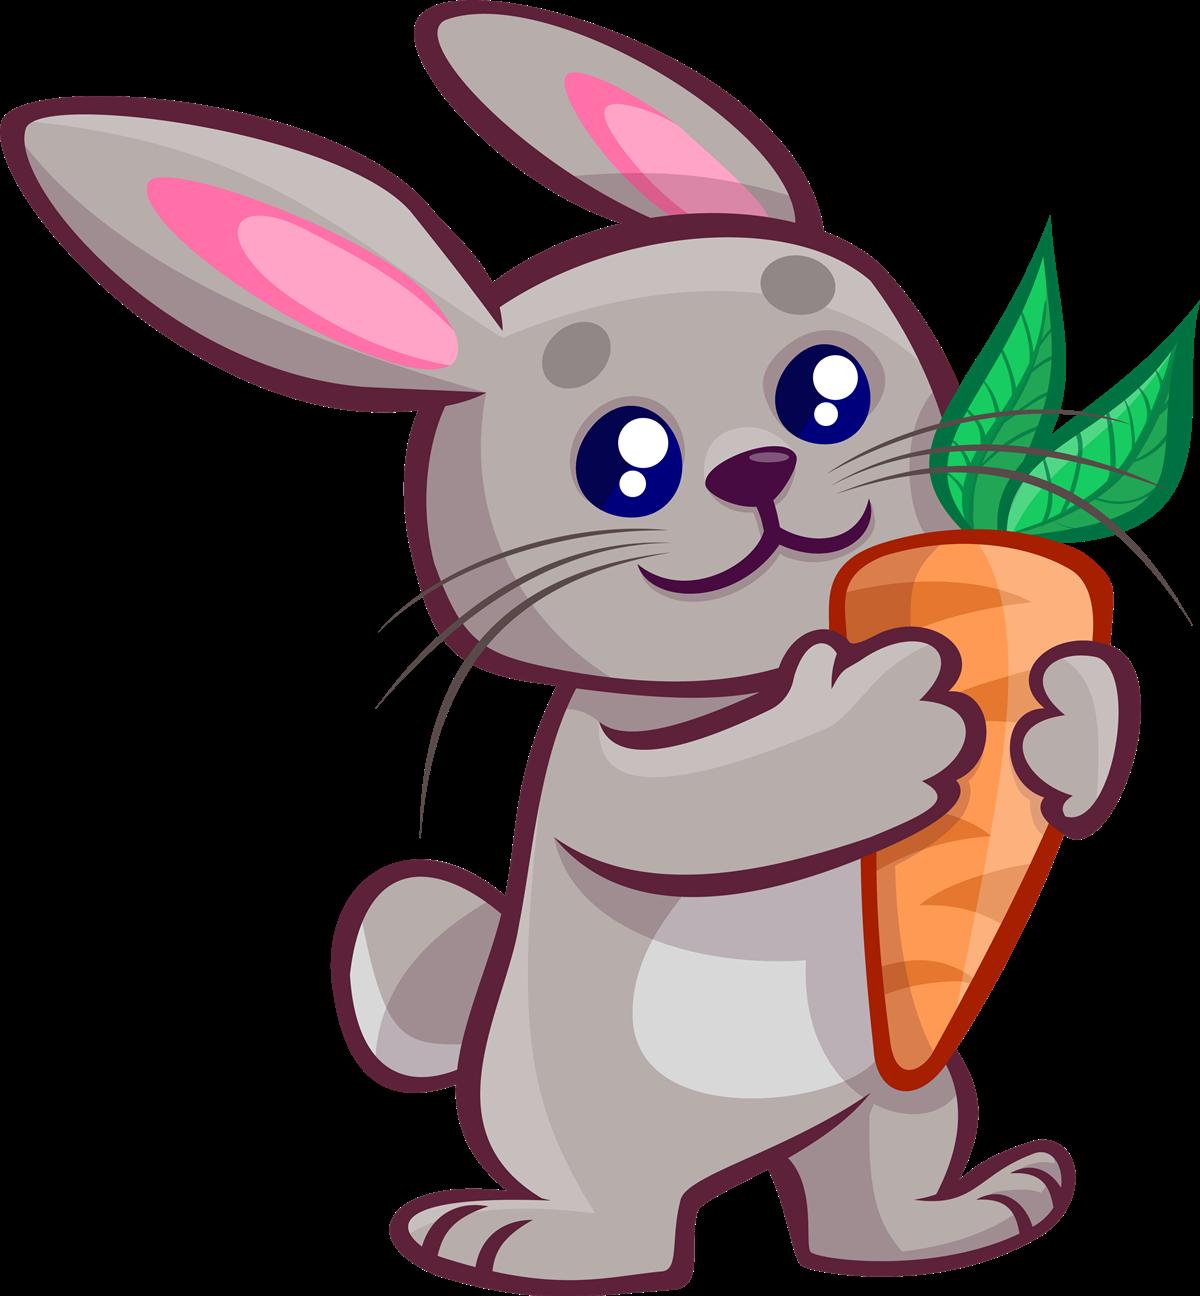 Free Cartoon Bunny Holding A Carrot Clip-Free Cartoon Bunny Holding a Carrot Clip Art-12